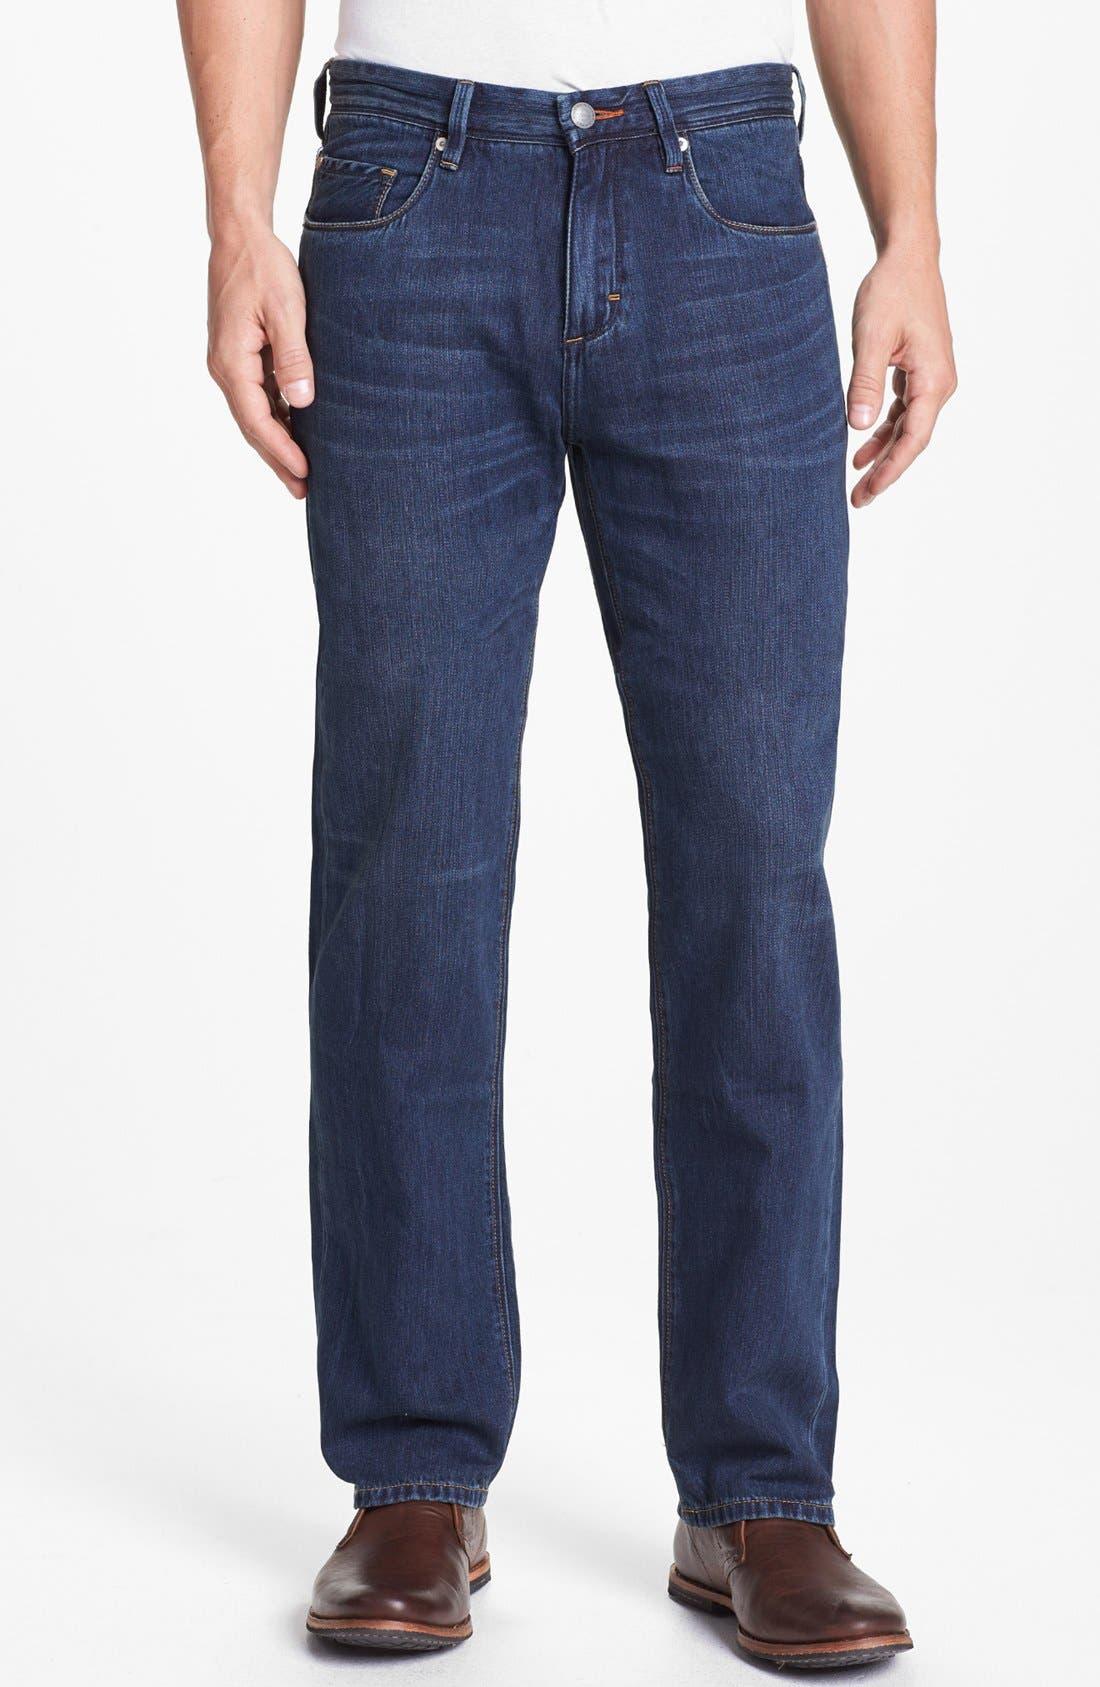 Alternate Image 1 Selected - Tommy Bahama Denim 'Coastal Island' Standard Fit Jeans (Dark Storm)